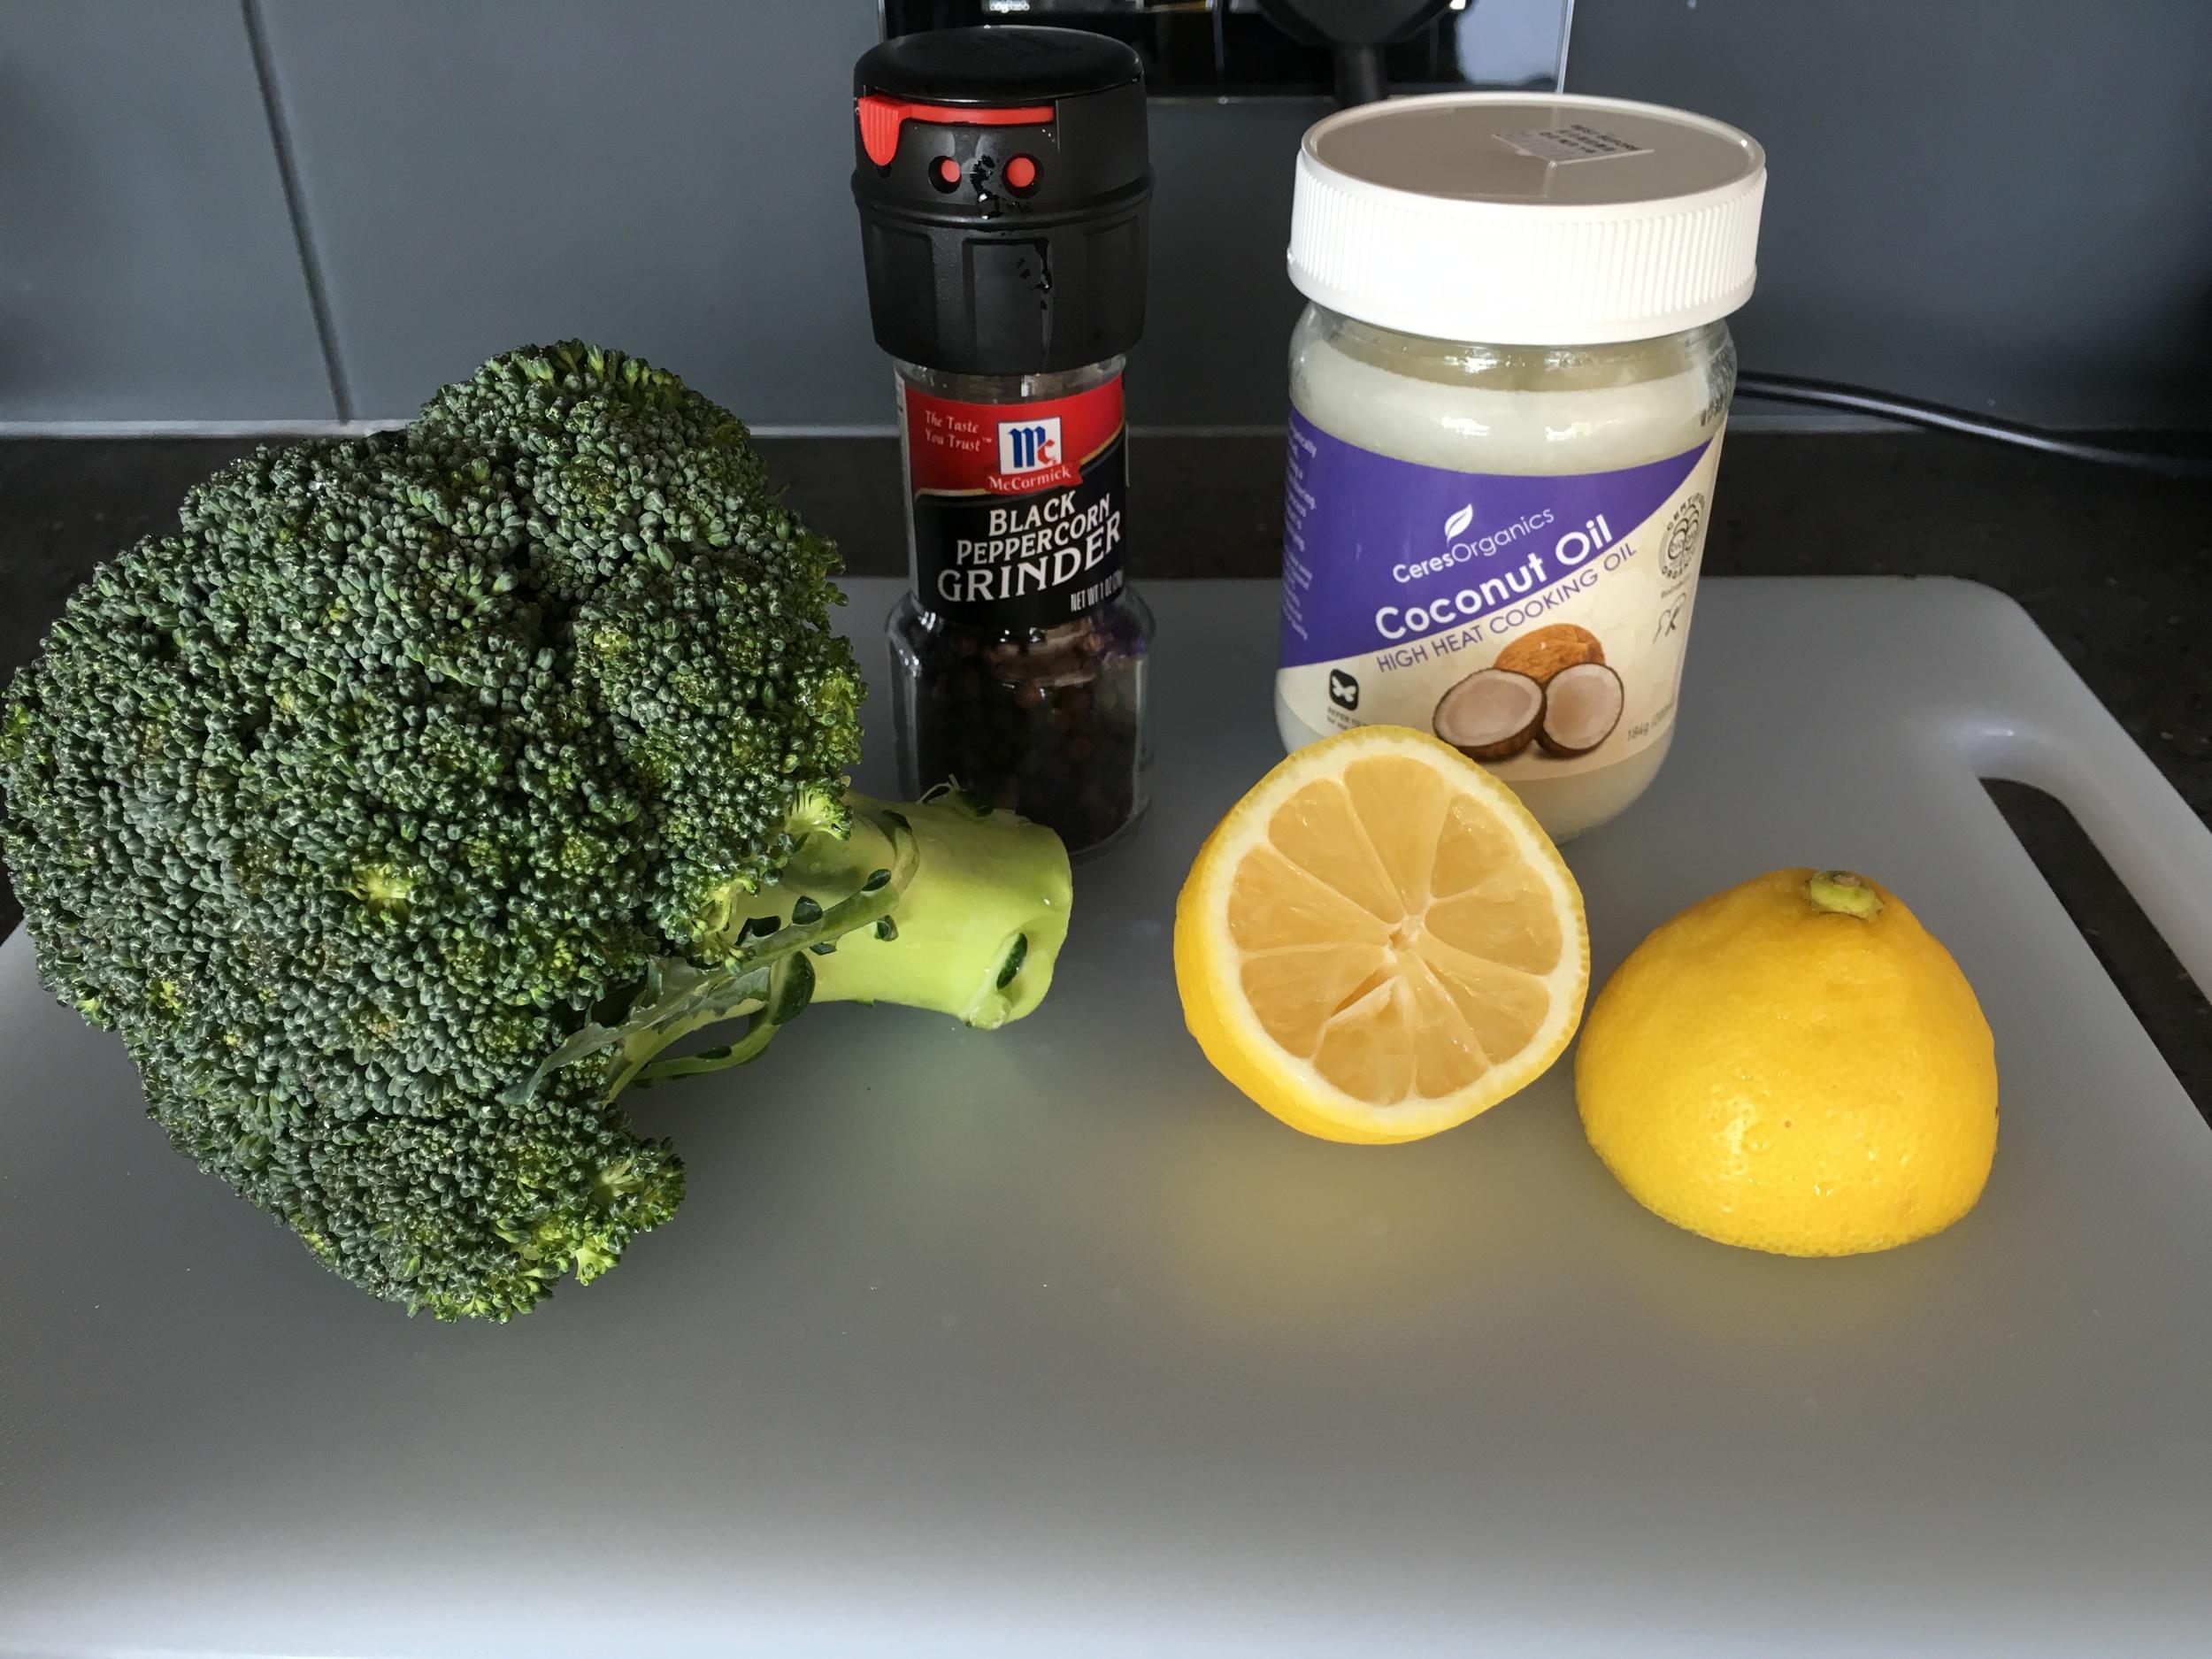 Ingredients: Fresh broccoli, lemon, fresh ground pepper, and coconut oil